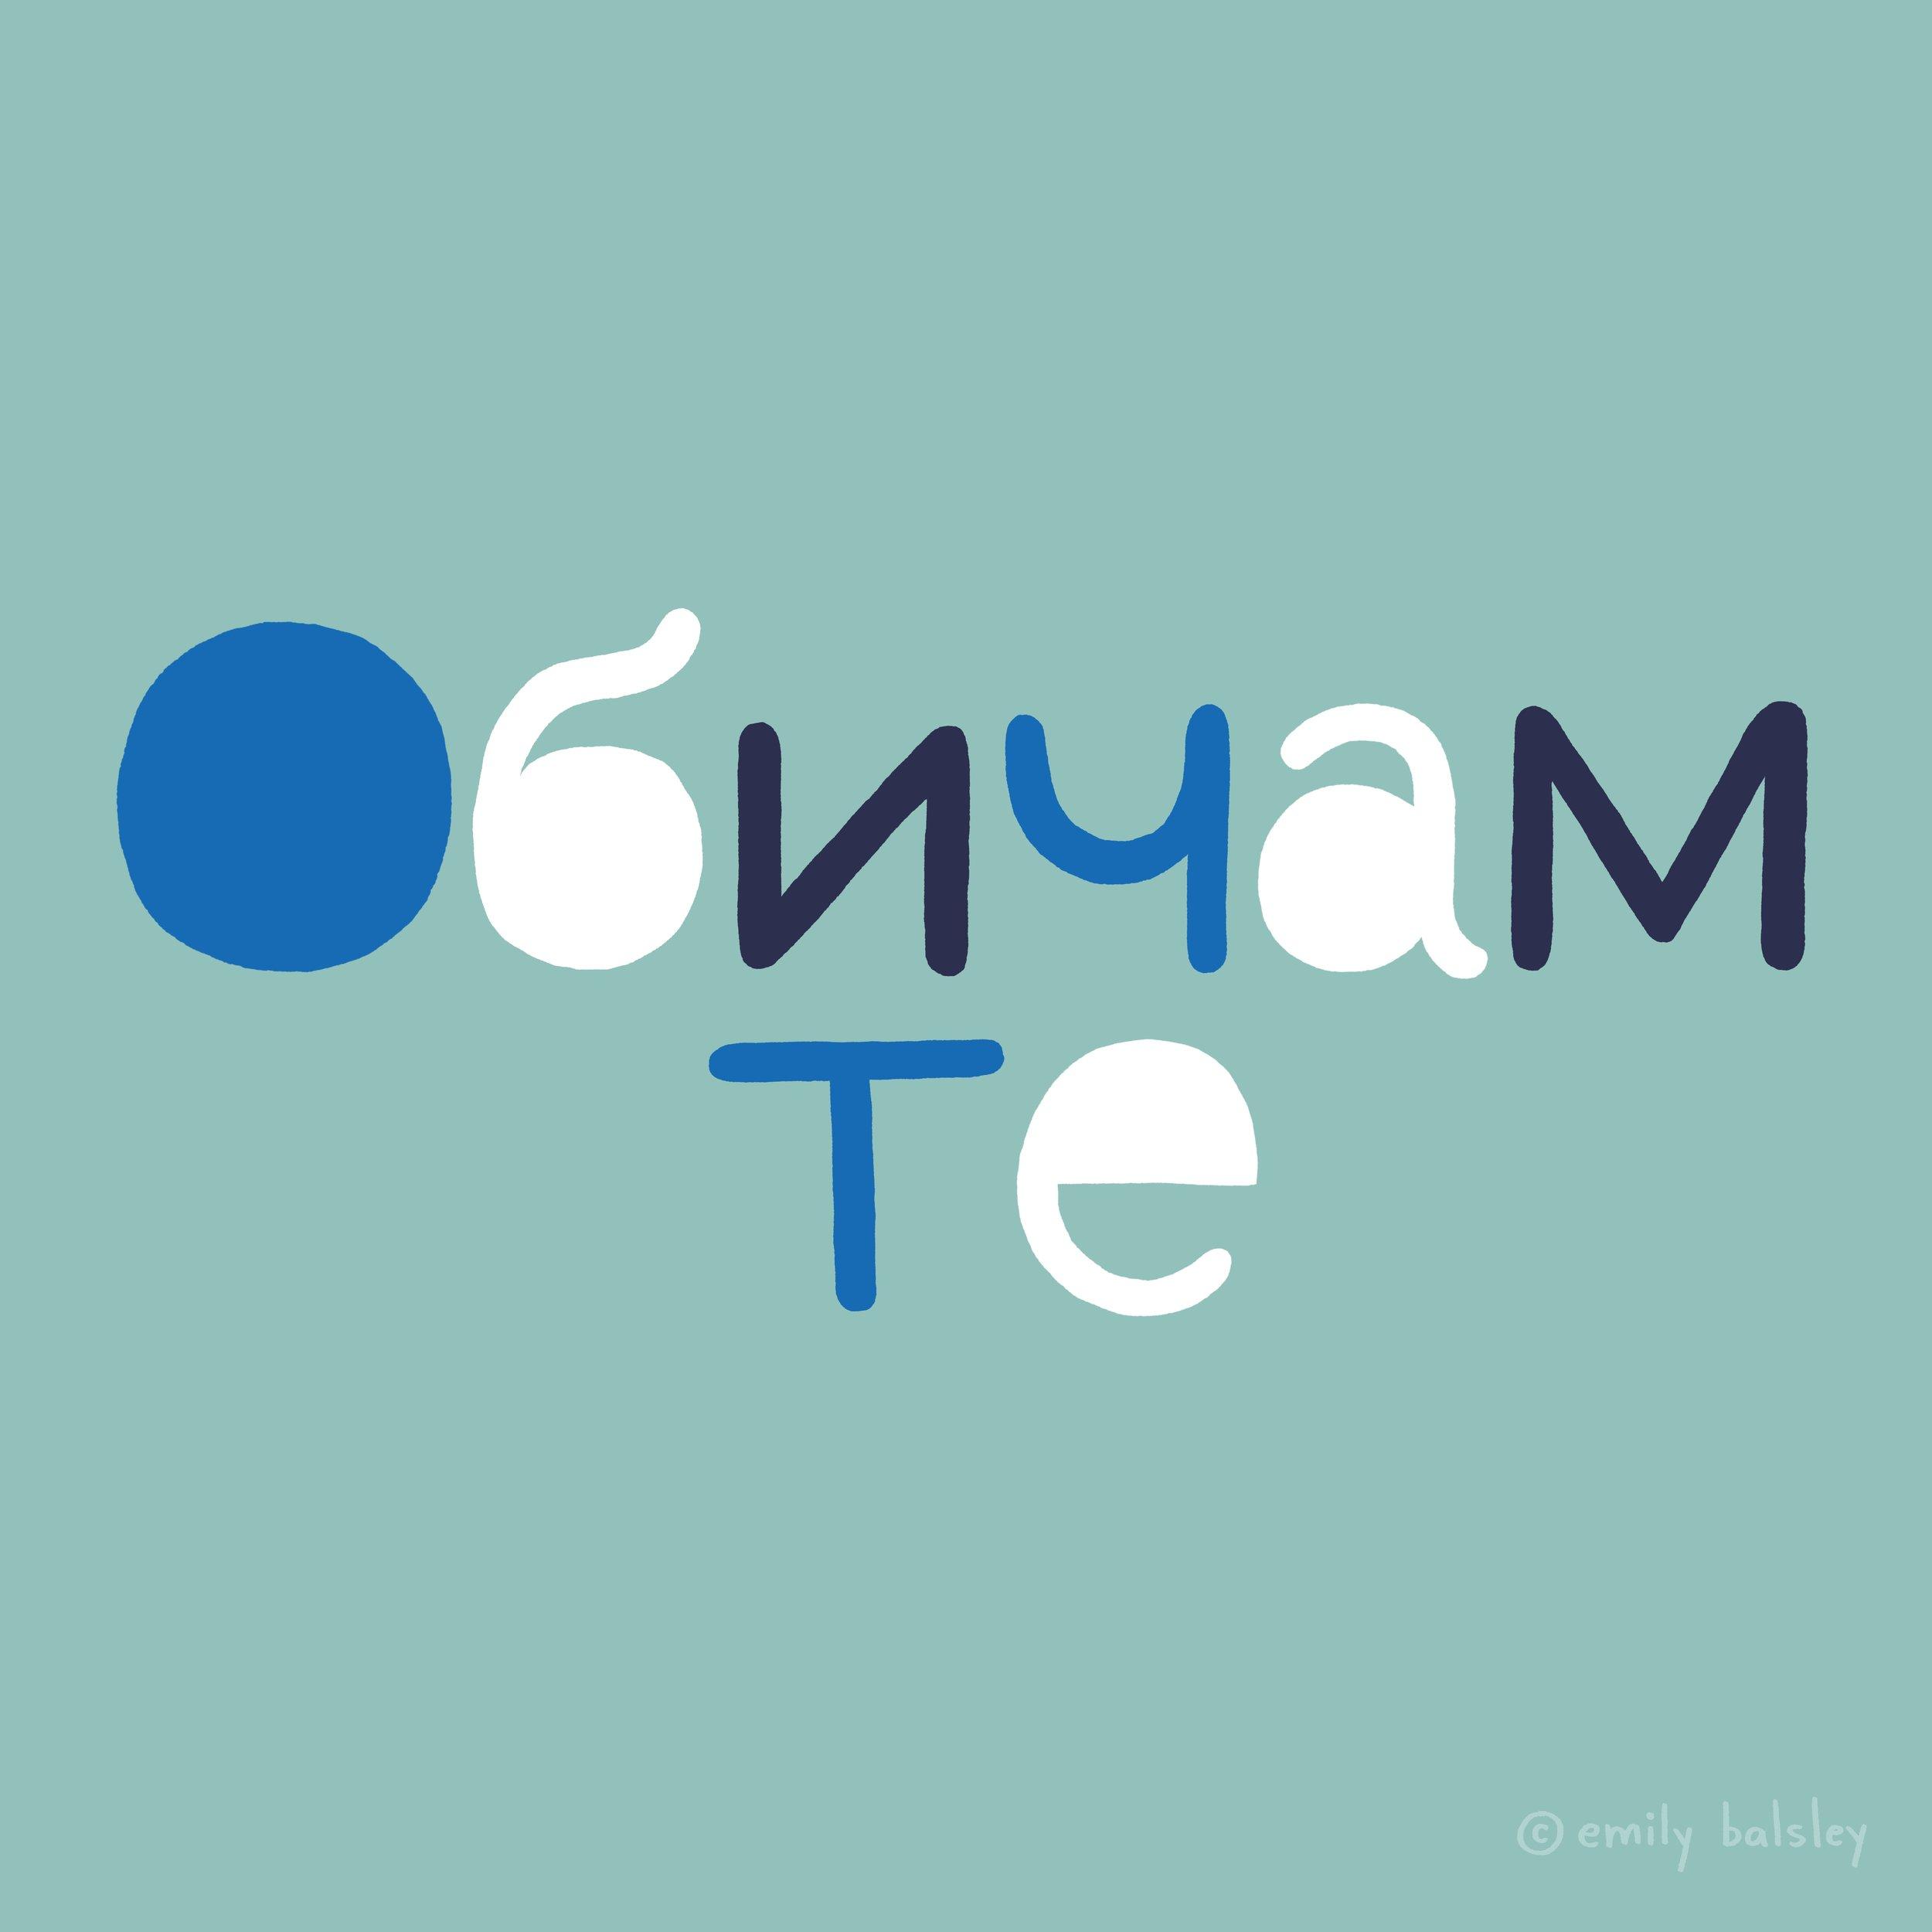 100days_-_Day05_-_Bulgarian.jpg